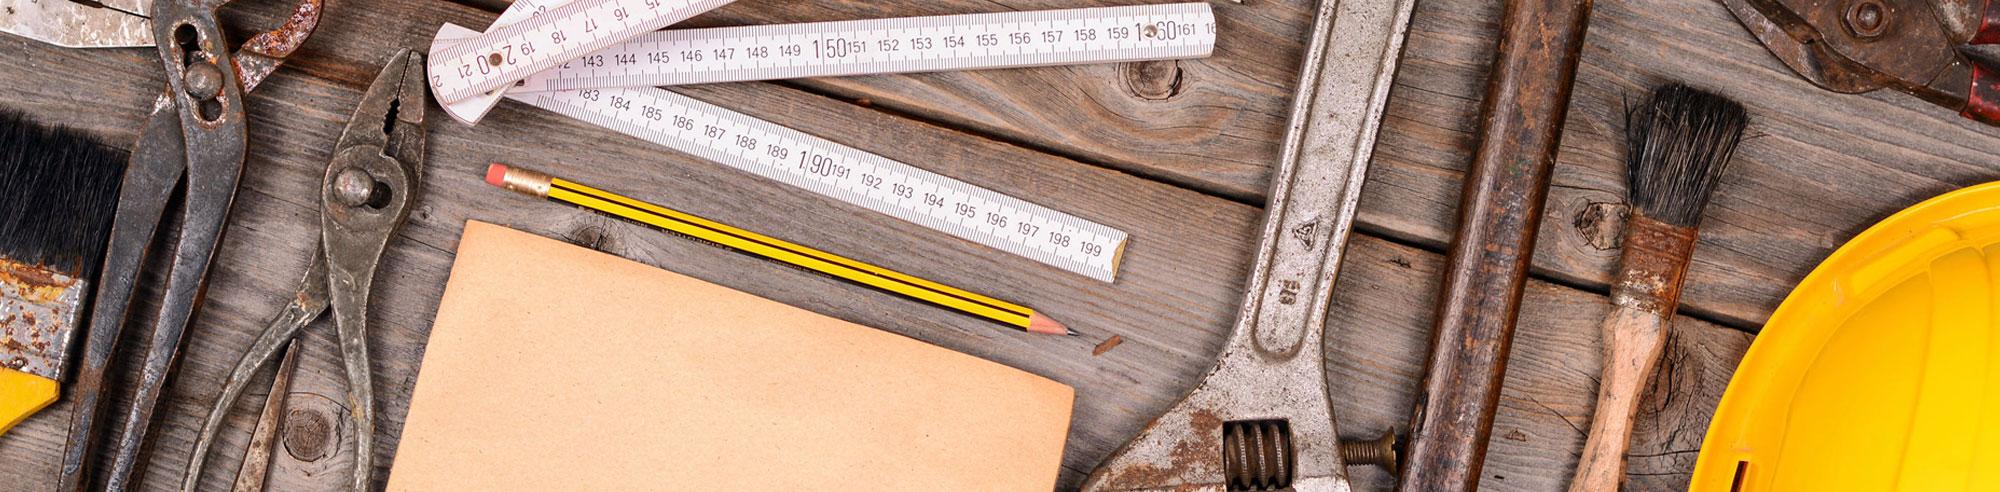 Residential Maintenance Plans